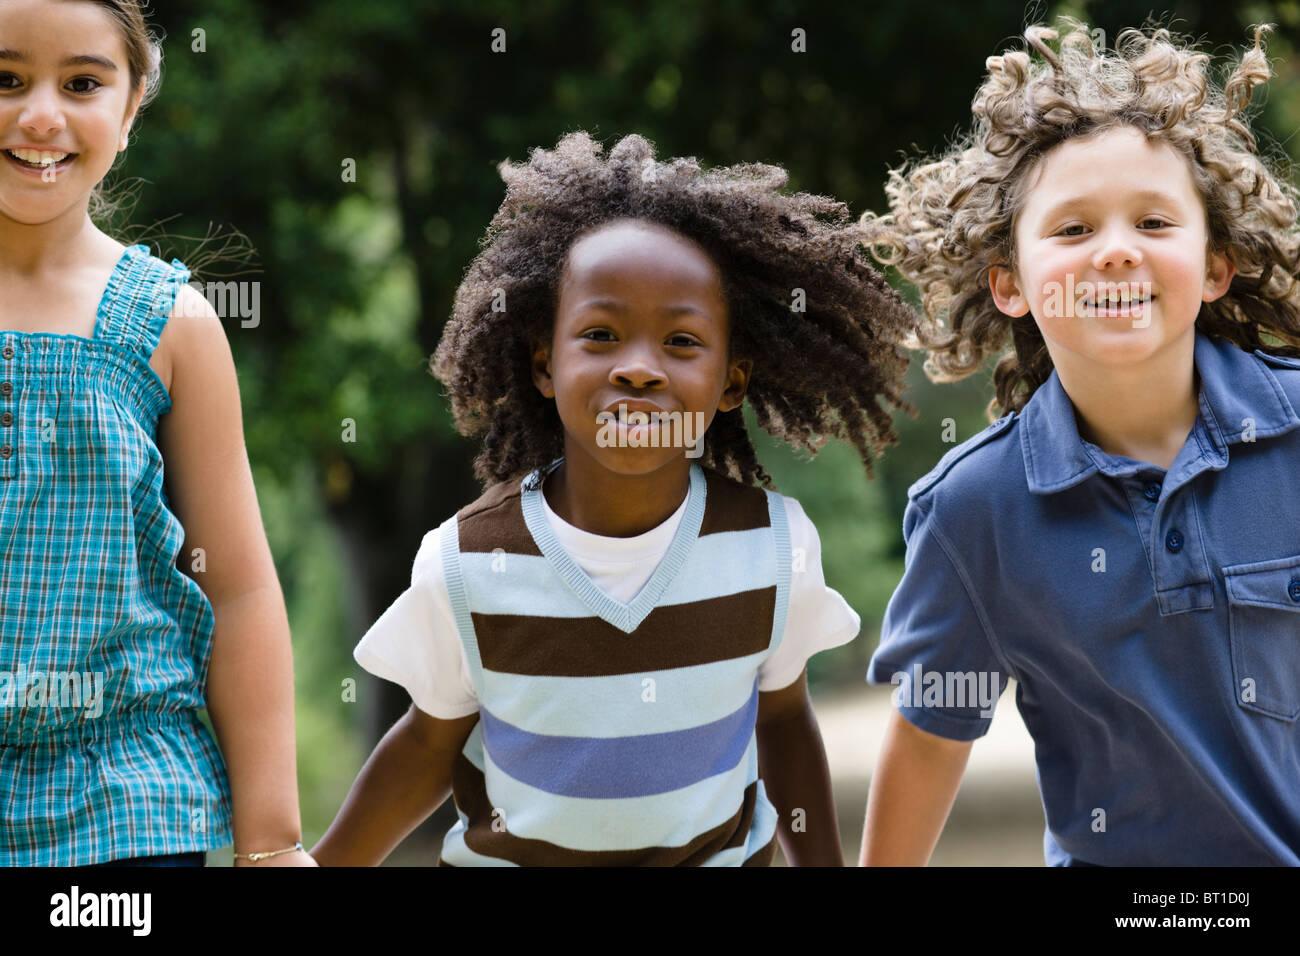 Holdings kids smile